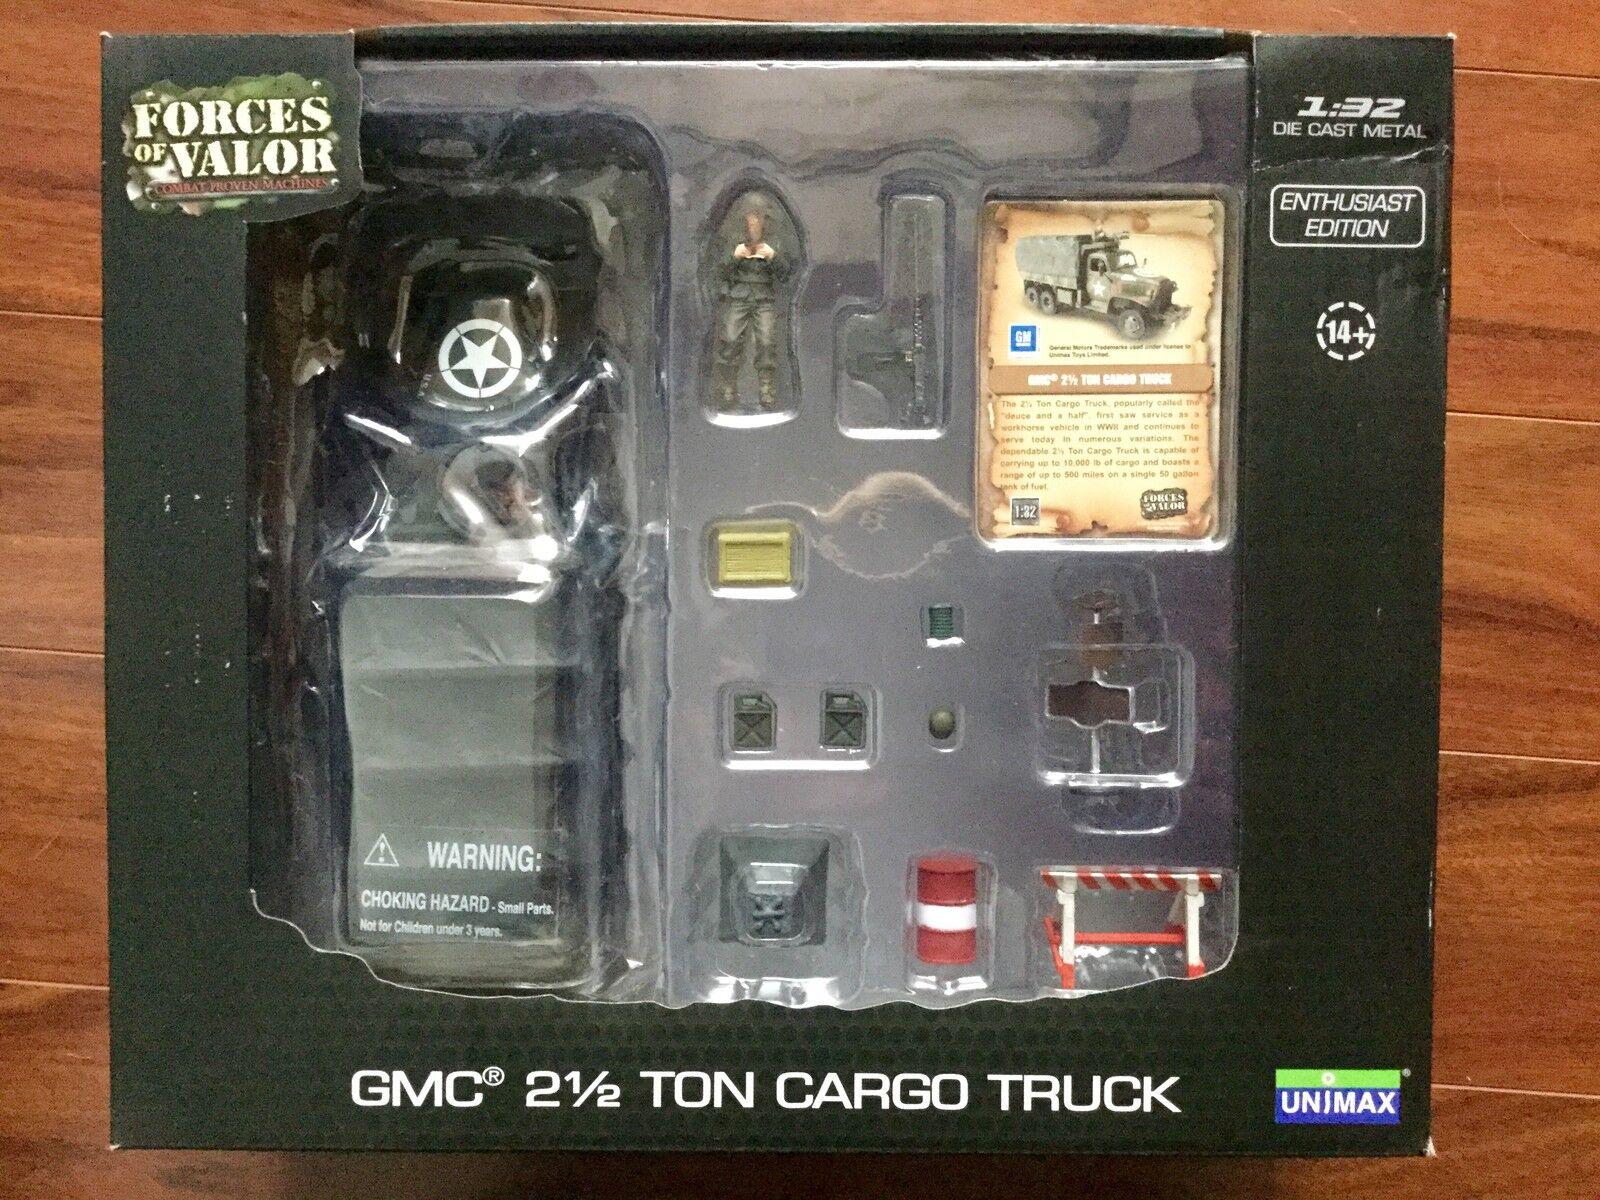 Forces of Valor 1 32 WW II  U.S. Army GMC 2-1 2 Ton Cargo Truck Item   80085 F S